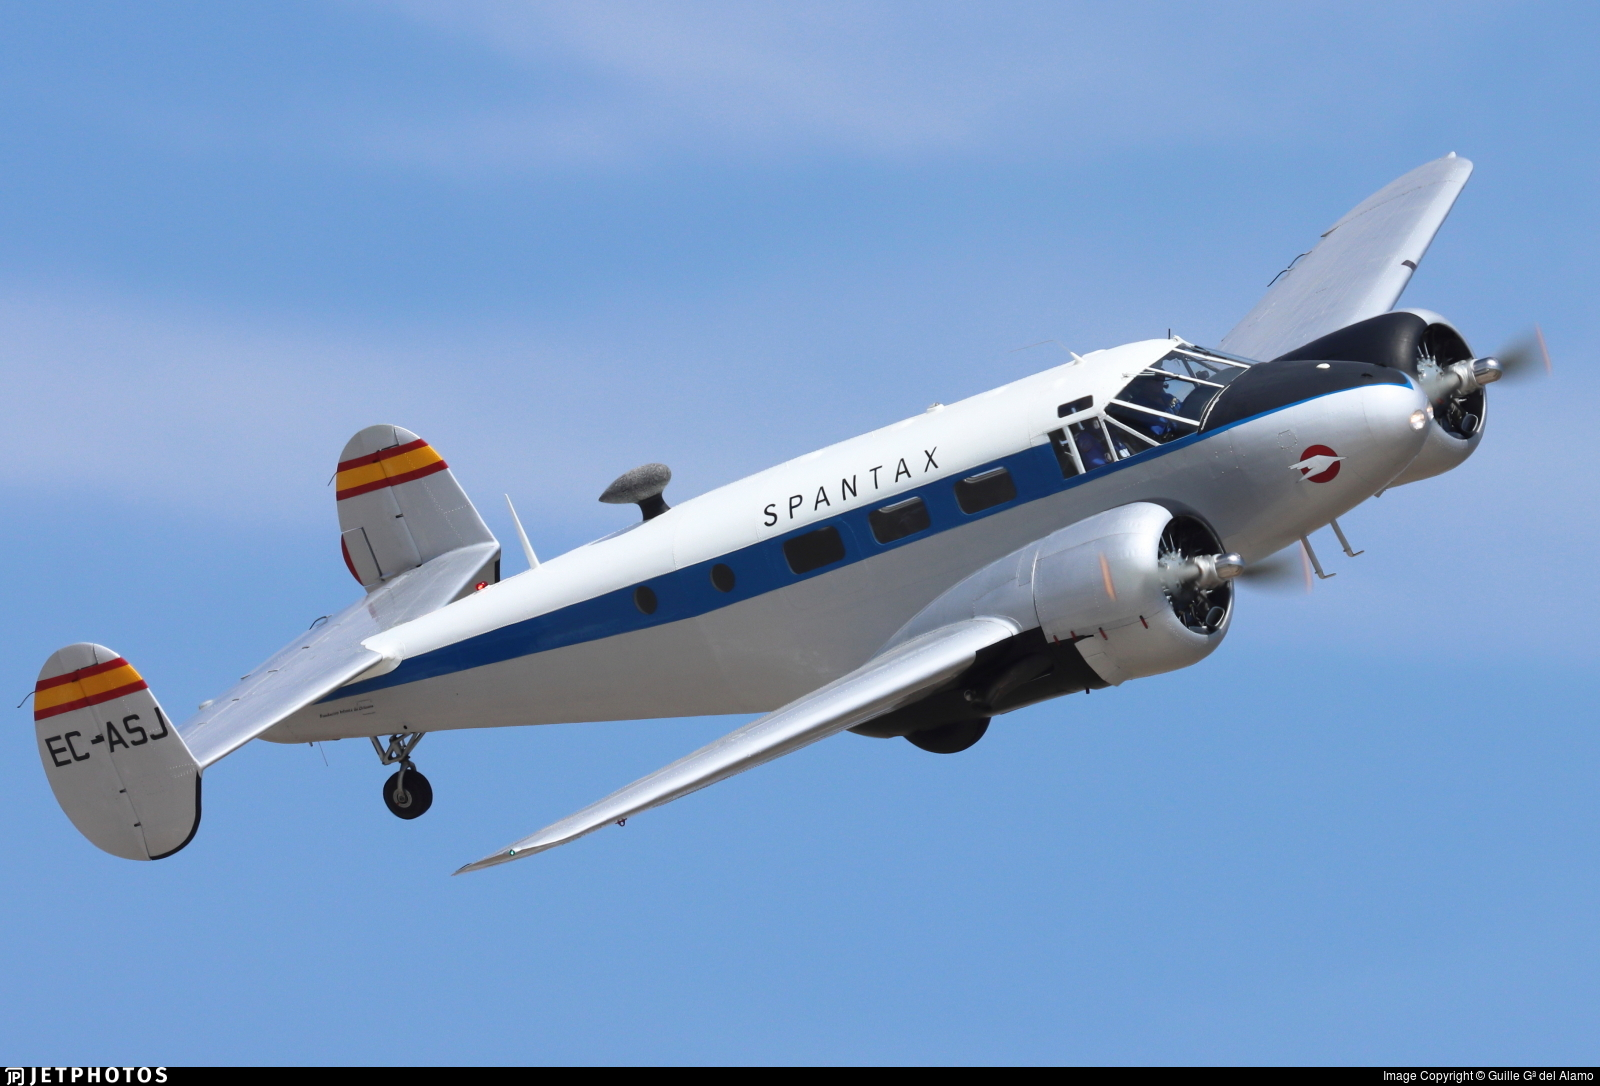 EC-ASJ - Beechcraft 18 - Spantax